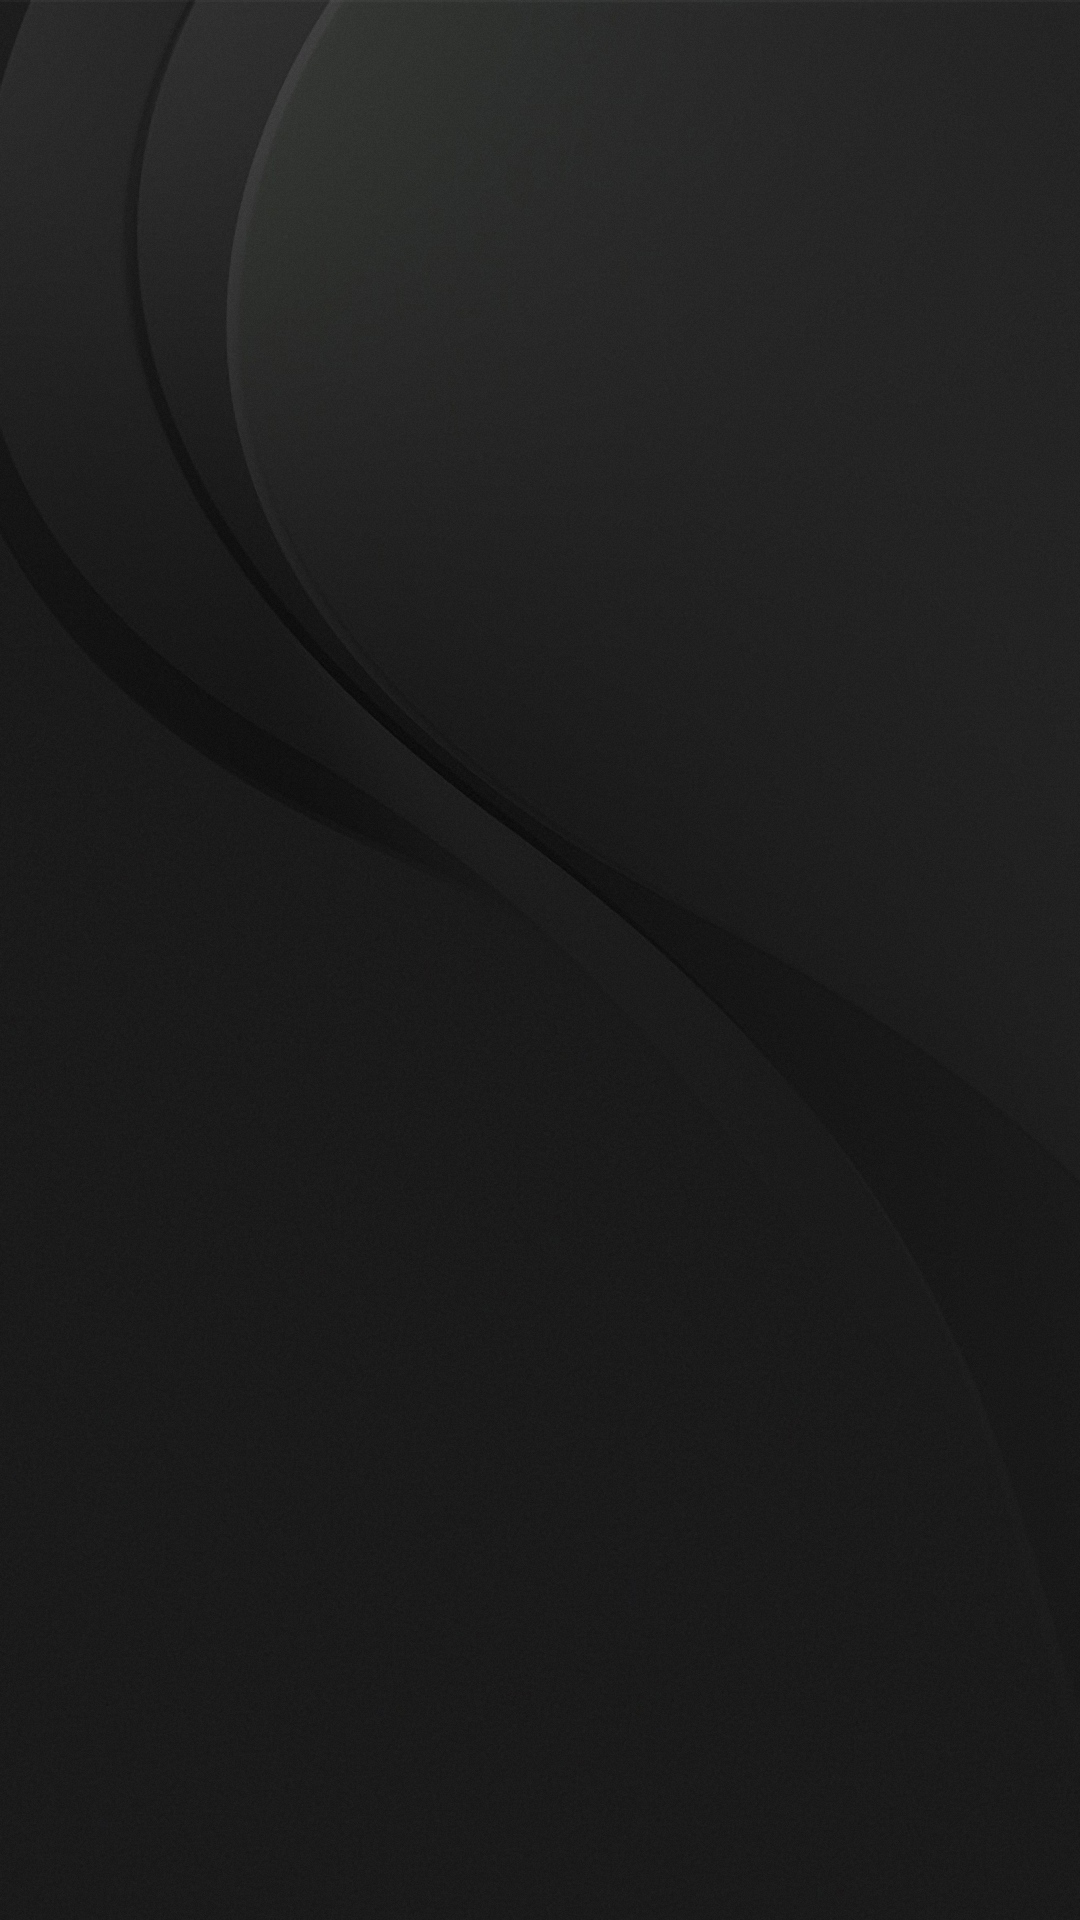 Stylish Black Smartphone Wallpaper